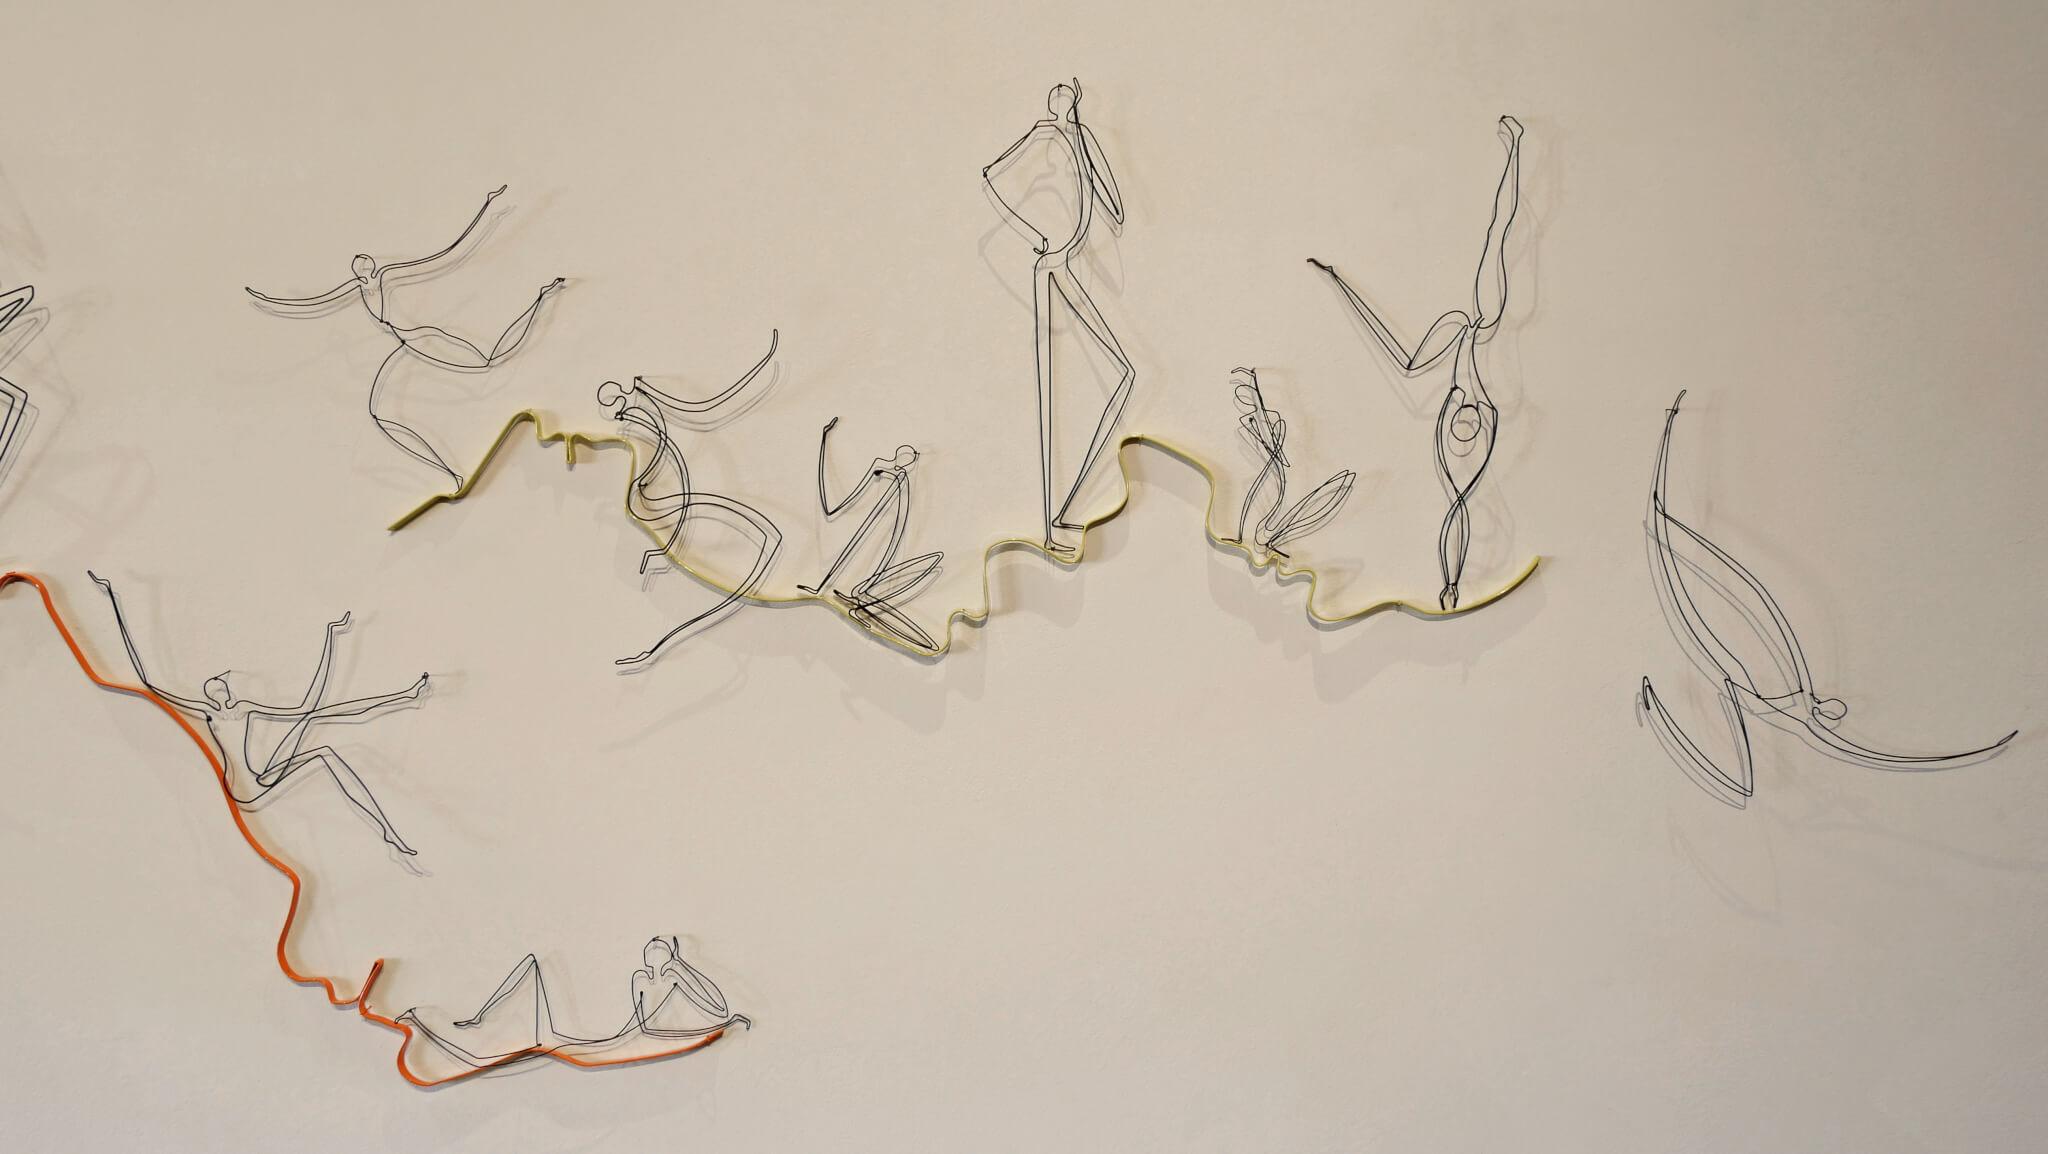 Pamela Merory Dernham, Fiddling While Rome Burns, 2017, wire sculpture, detail